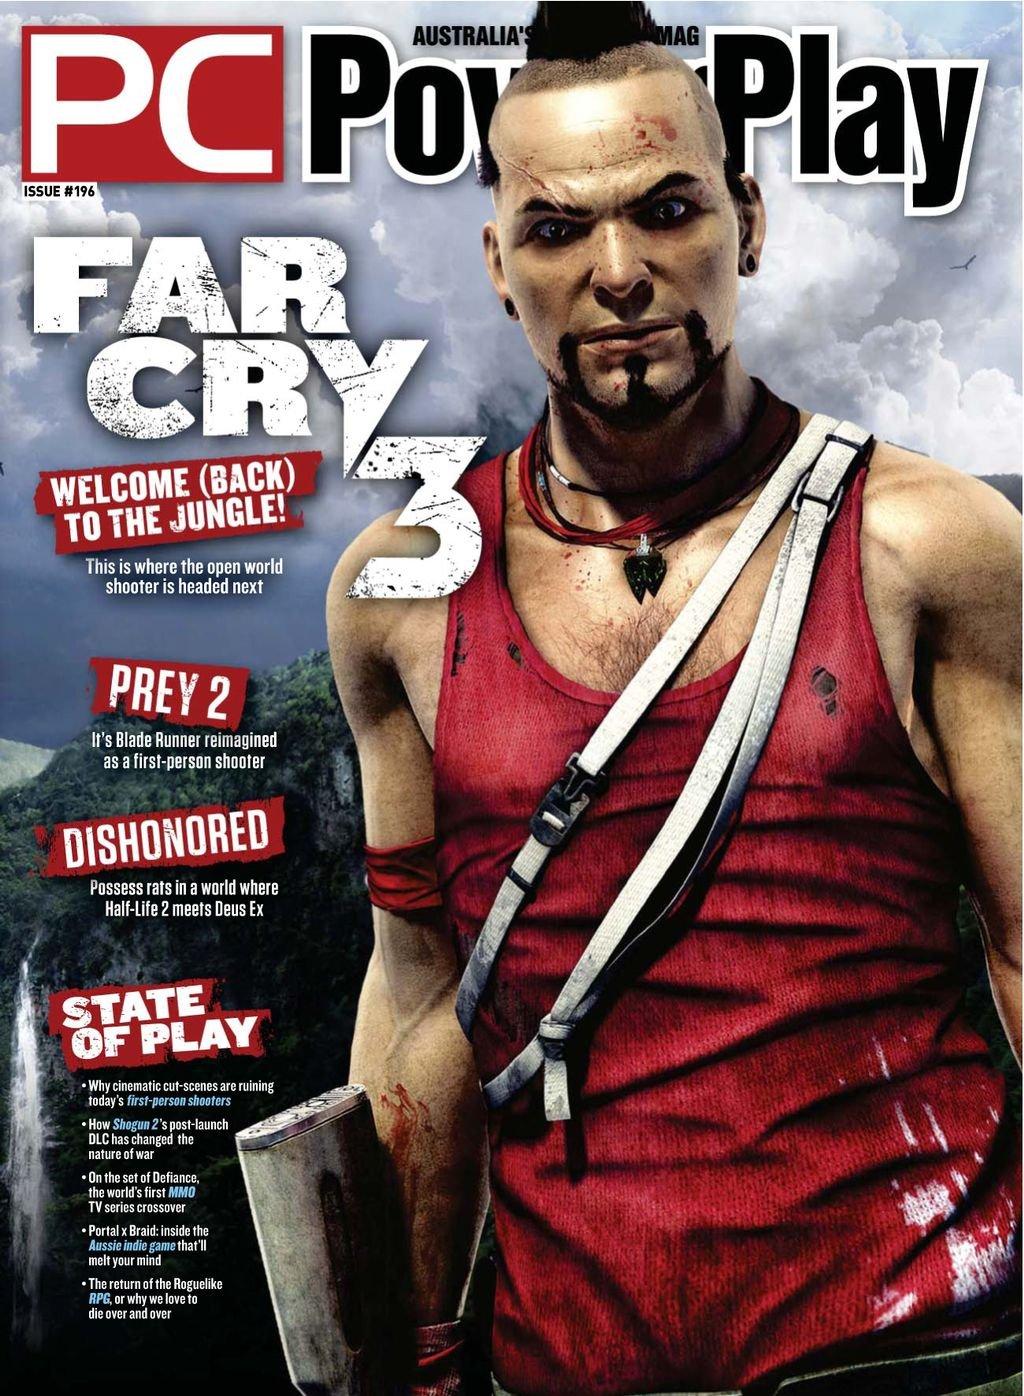 PC PowerPlay 196 (November 2011)